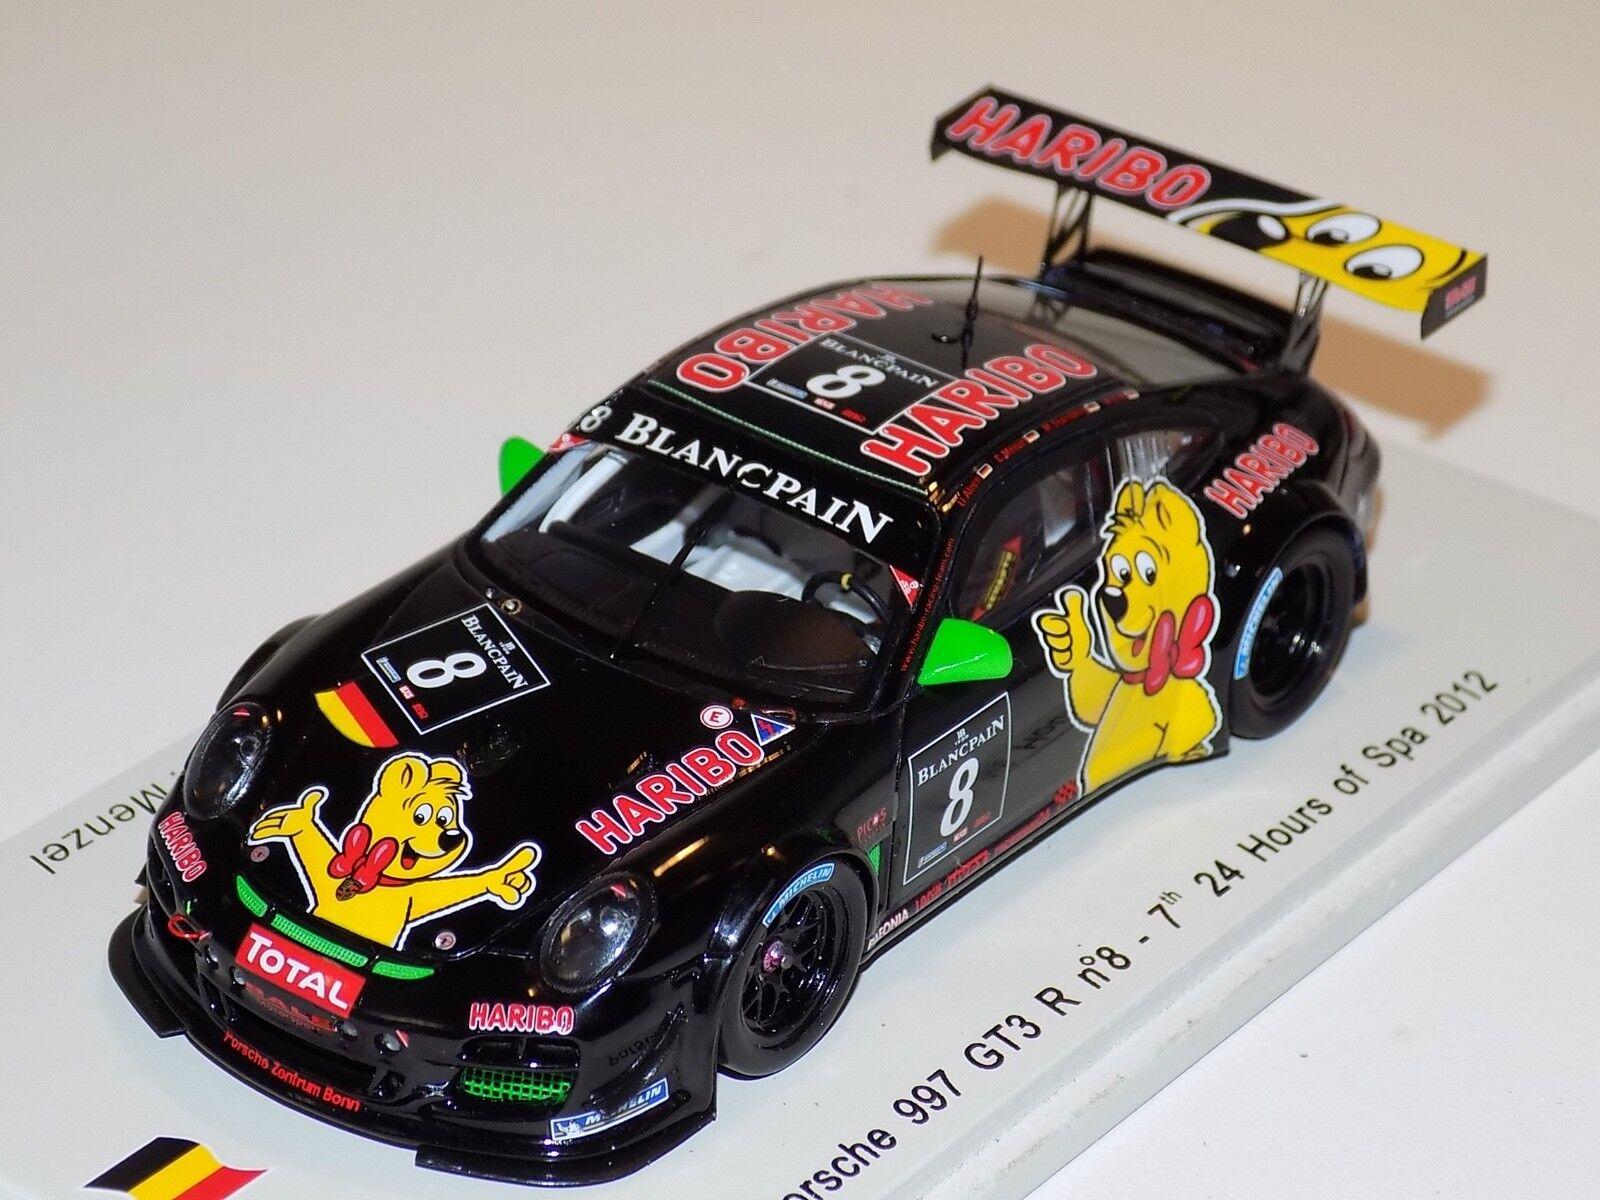 1/43 Spark Porsche 911   997   GT3 R Car  8  24 Hours of Spa 2012  SB031